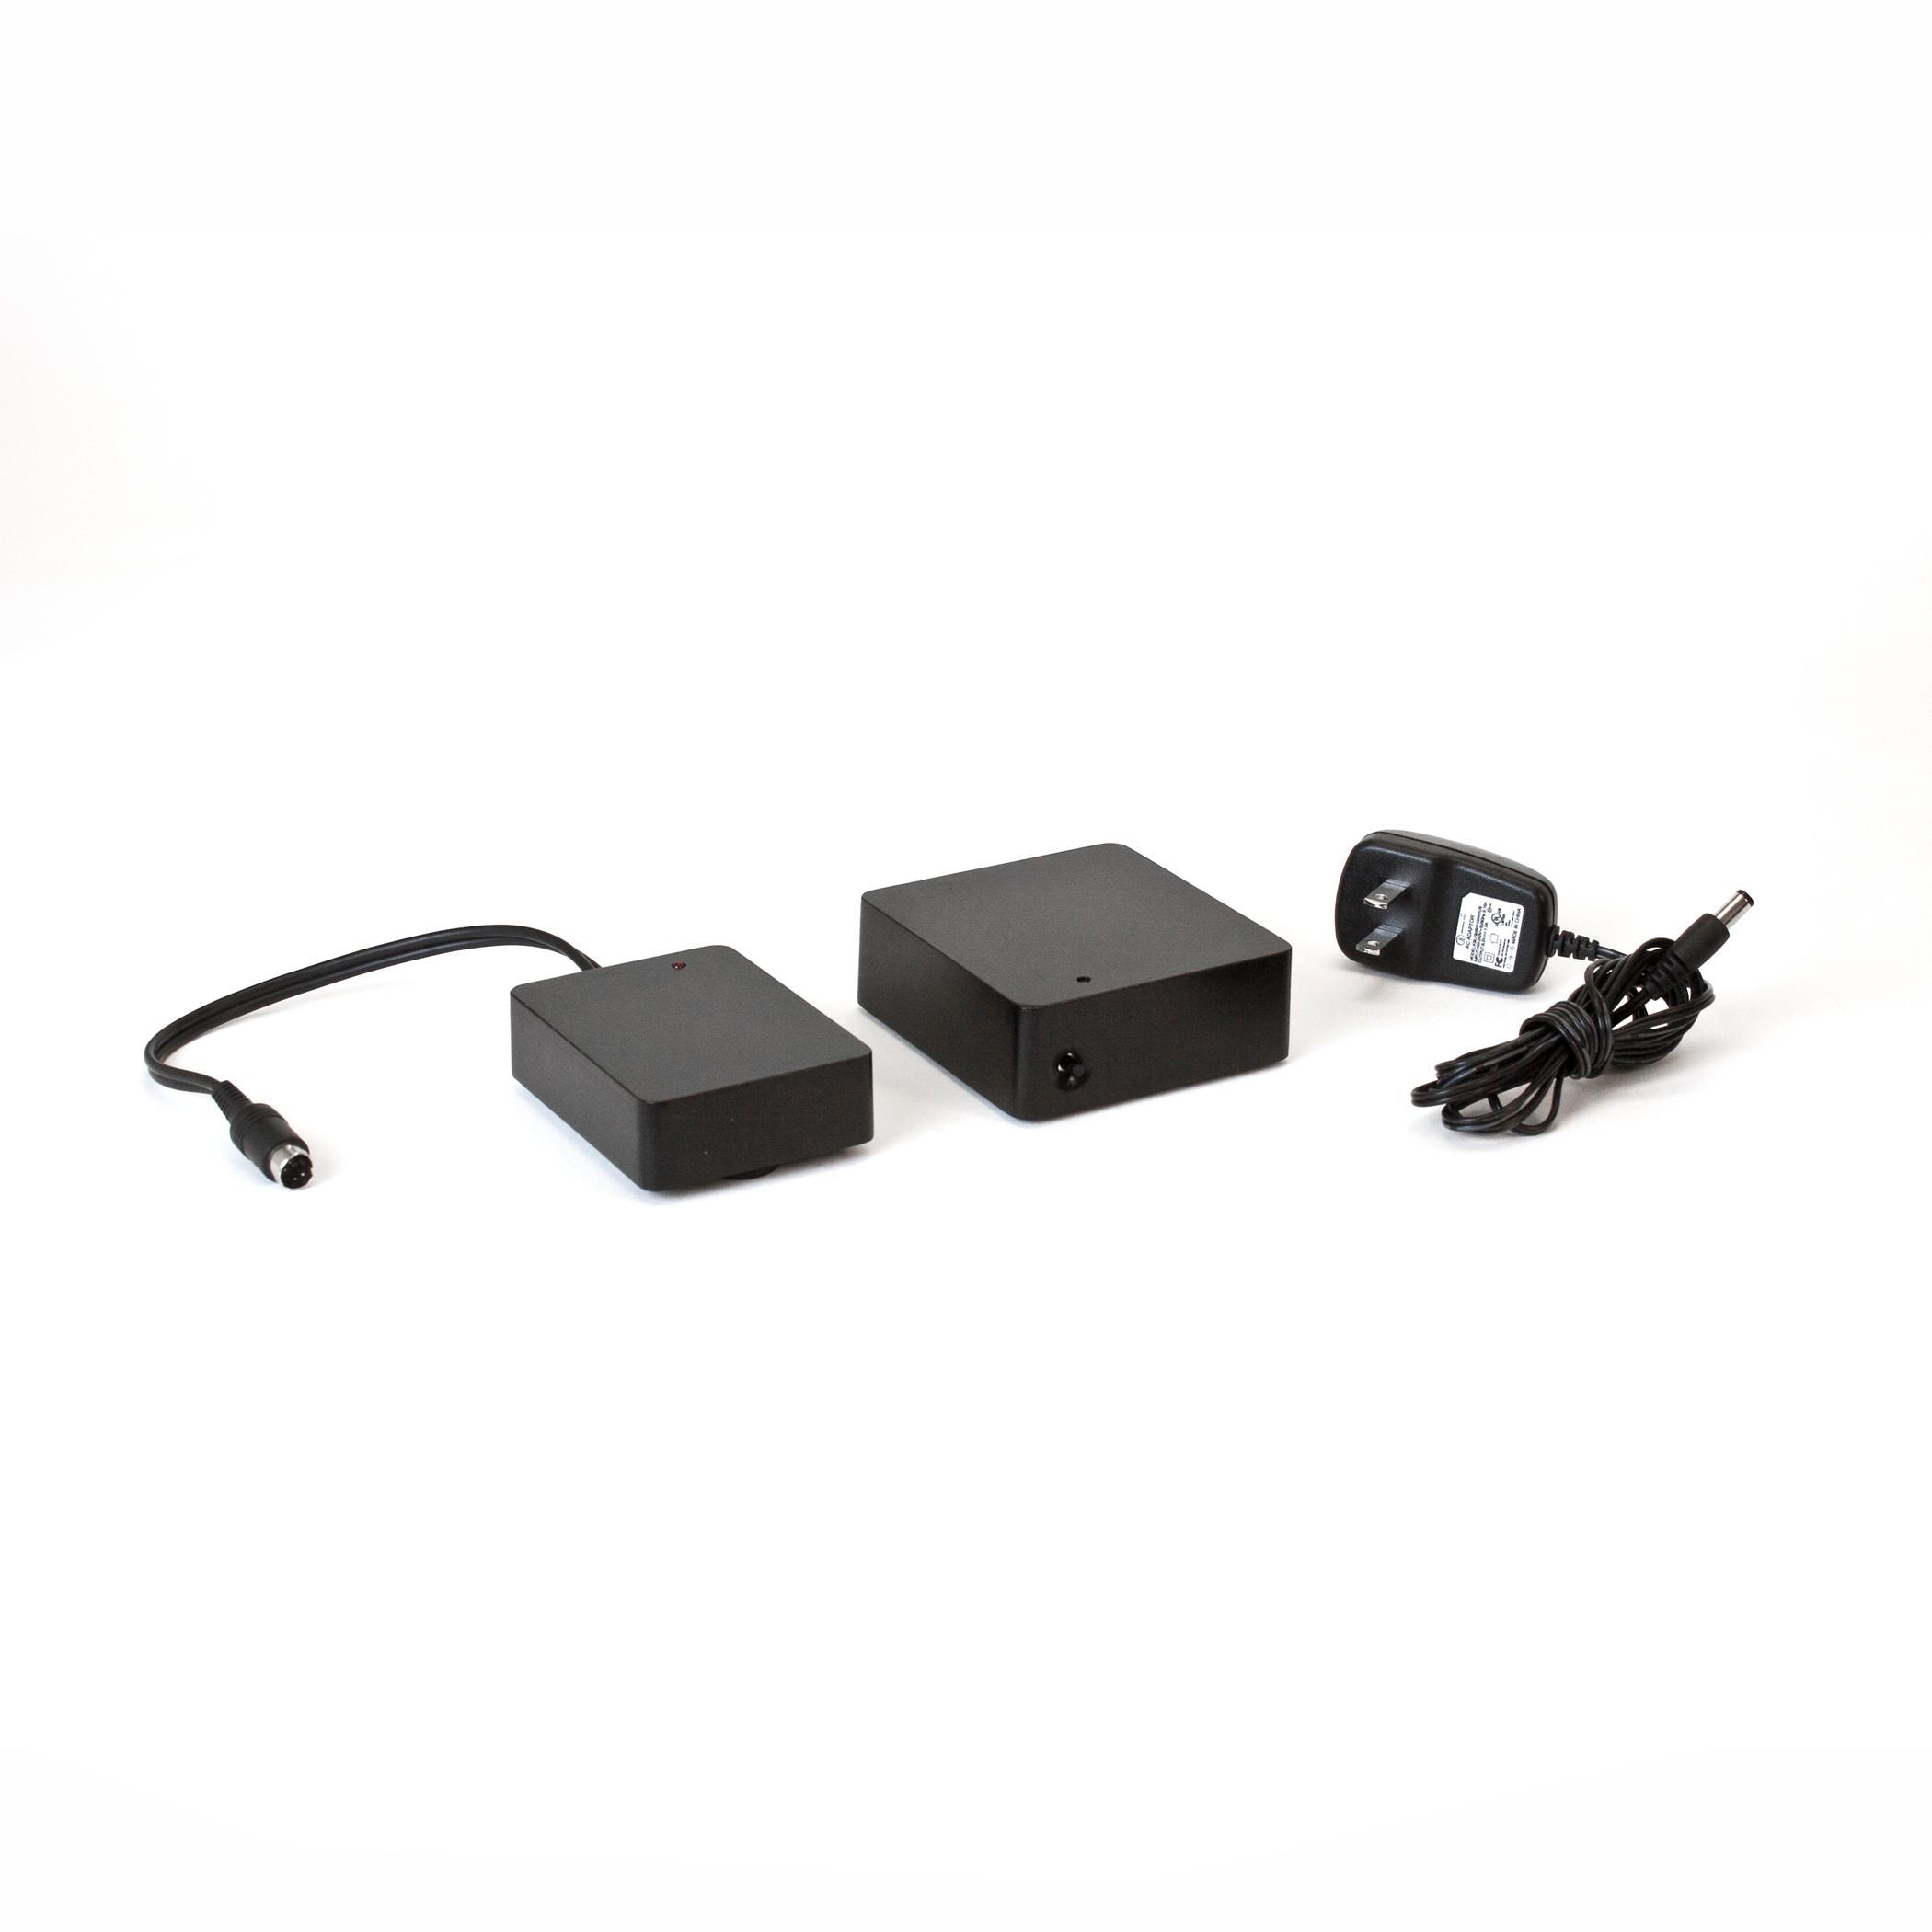 WA-2 Wireless Subwoofer Kit Klipsch® Certified Factory Refurbished